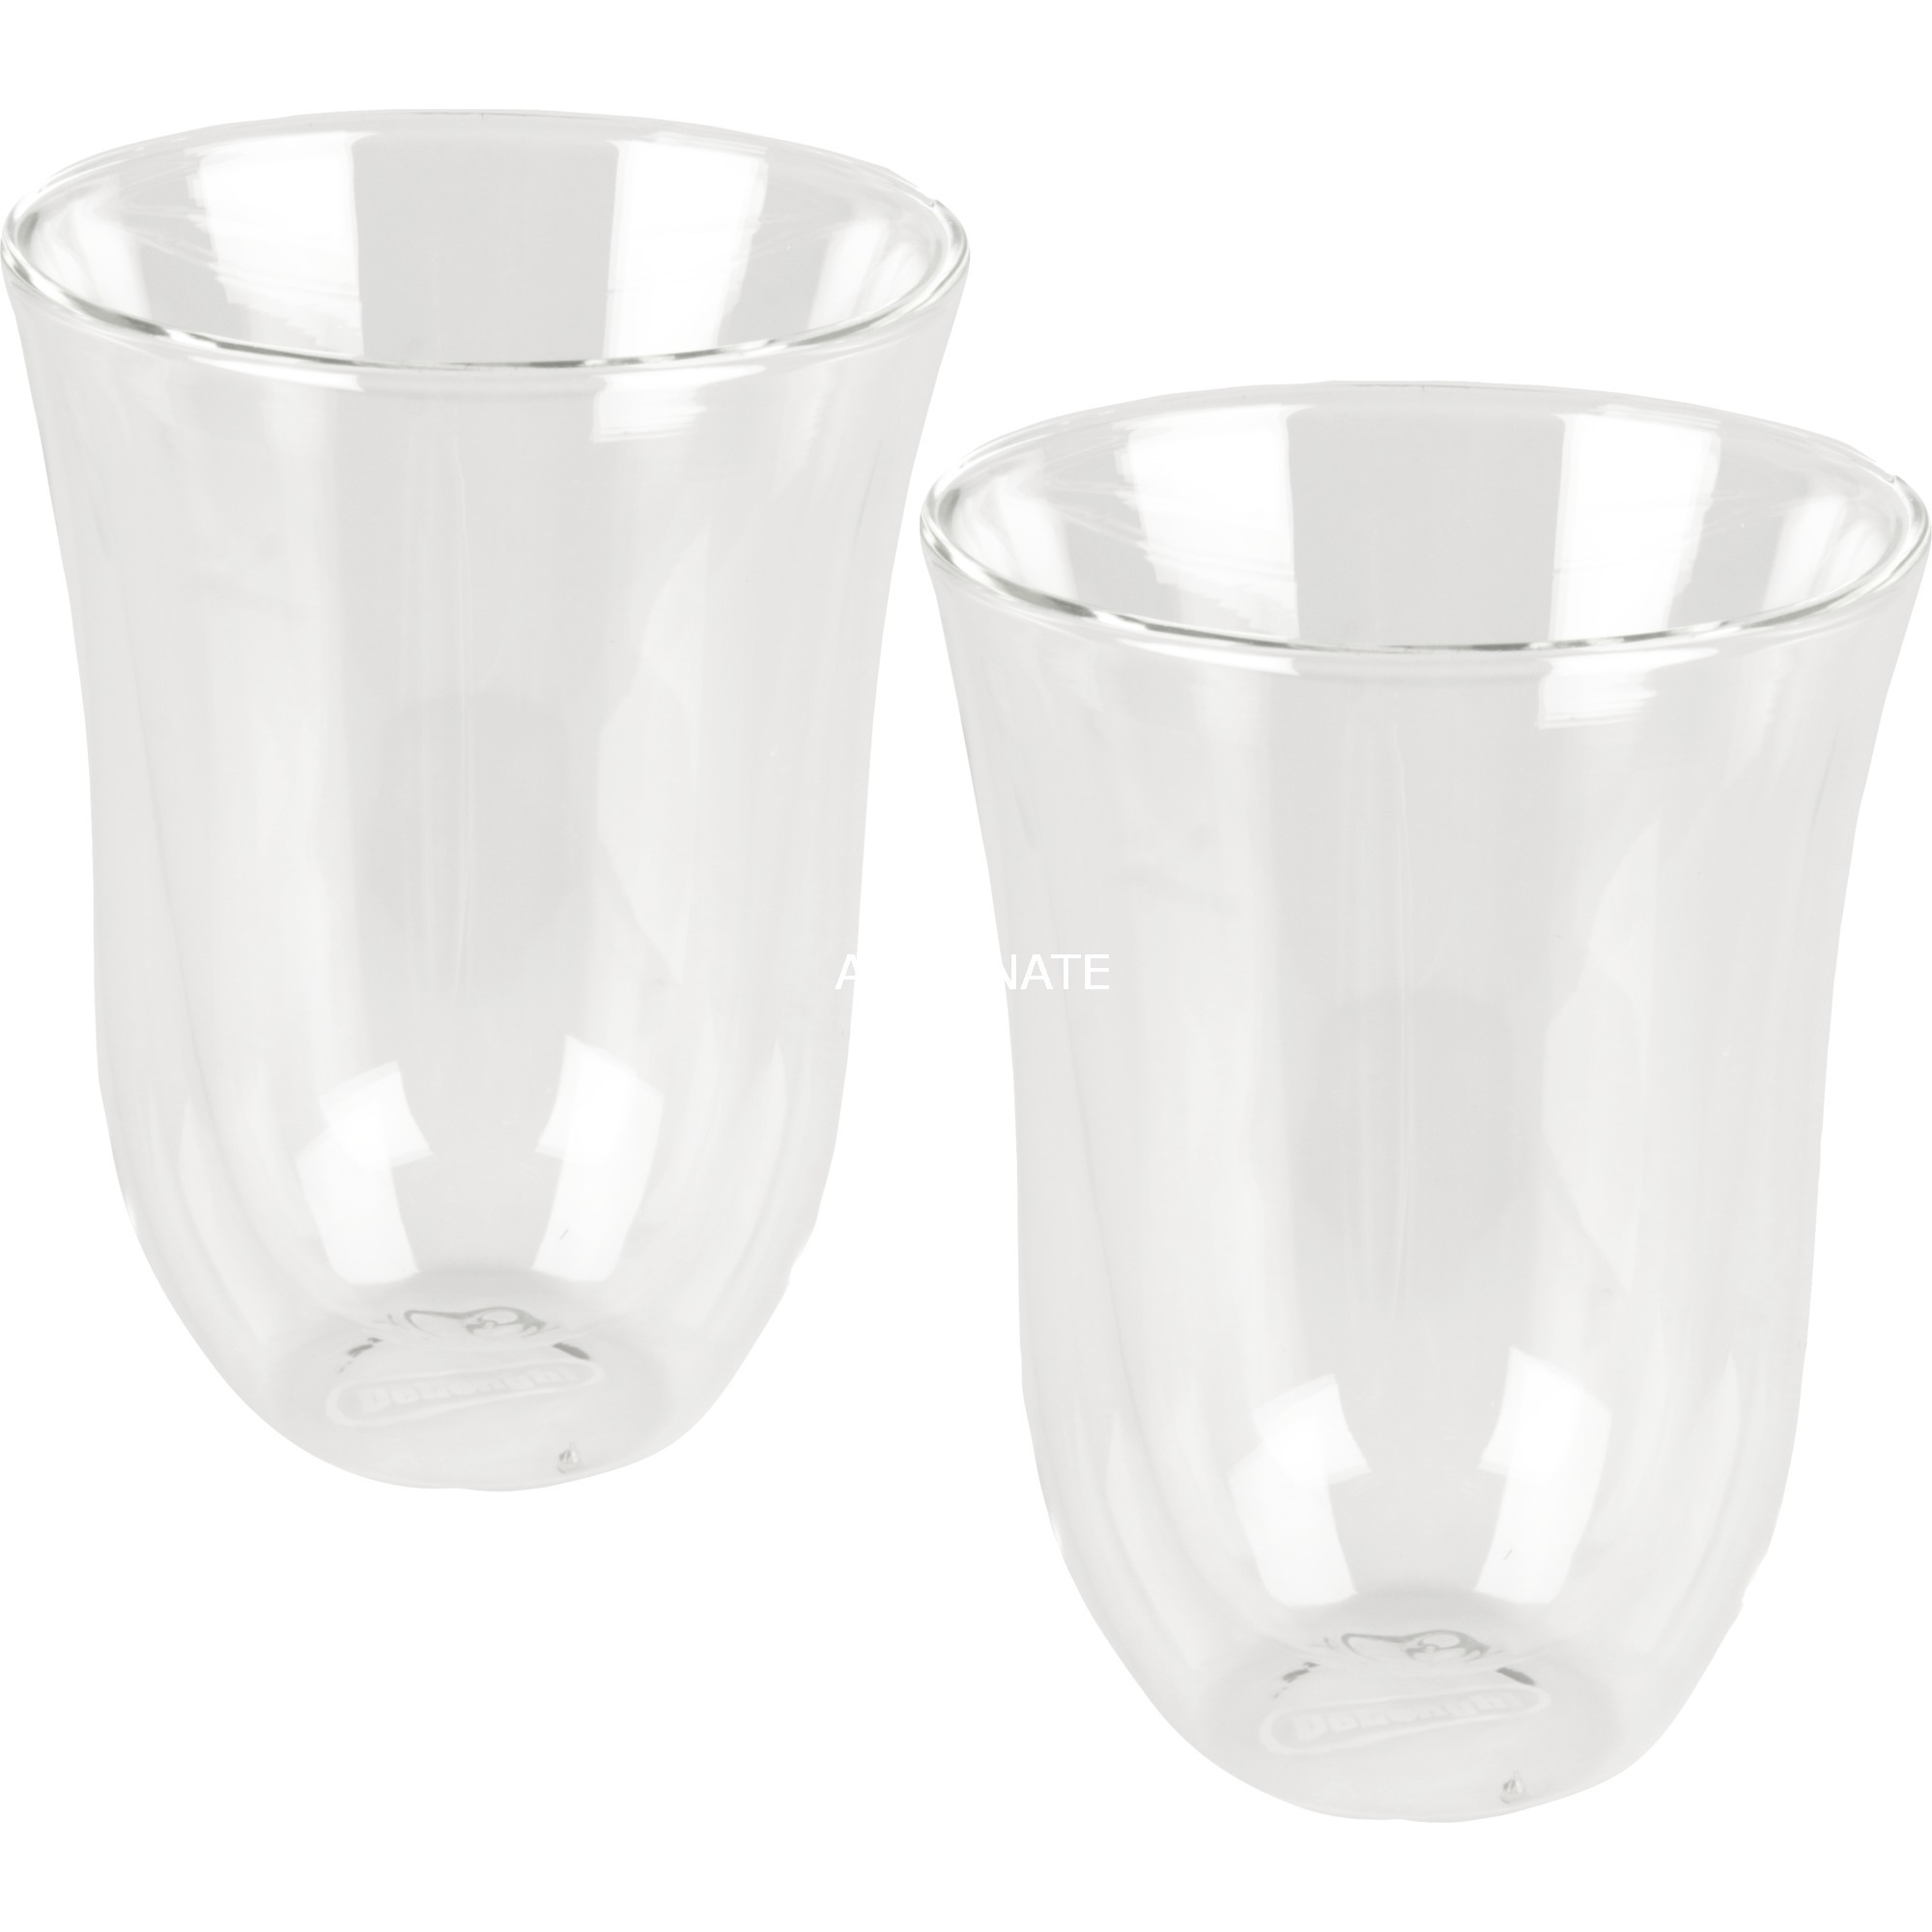 5513214611 Transparente 2pieza(s) 220ml vaso de café, Vidrio